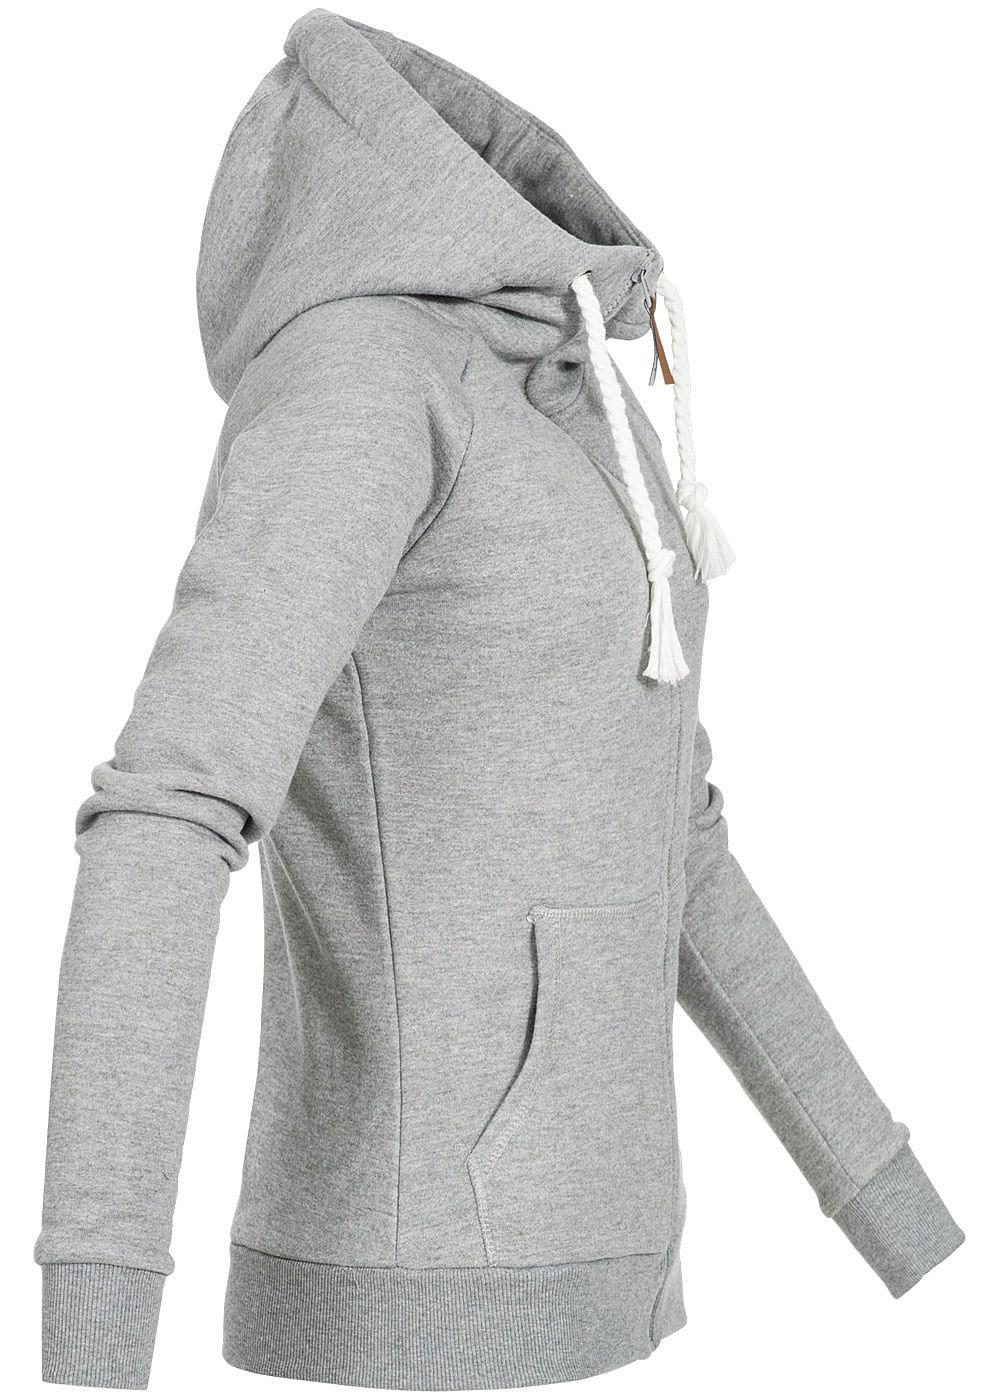 seventyseven lifestyle damen zip hoodie kapuze kordelzug 2 taschen hell grau melange 77onlineshop. Black Bedroom Furniture Sets. Home Design Ideas